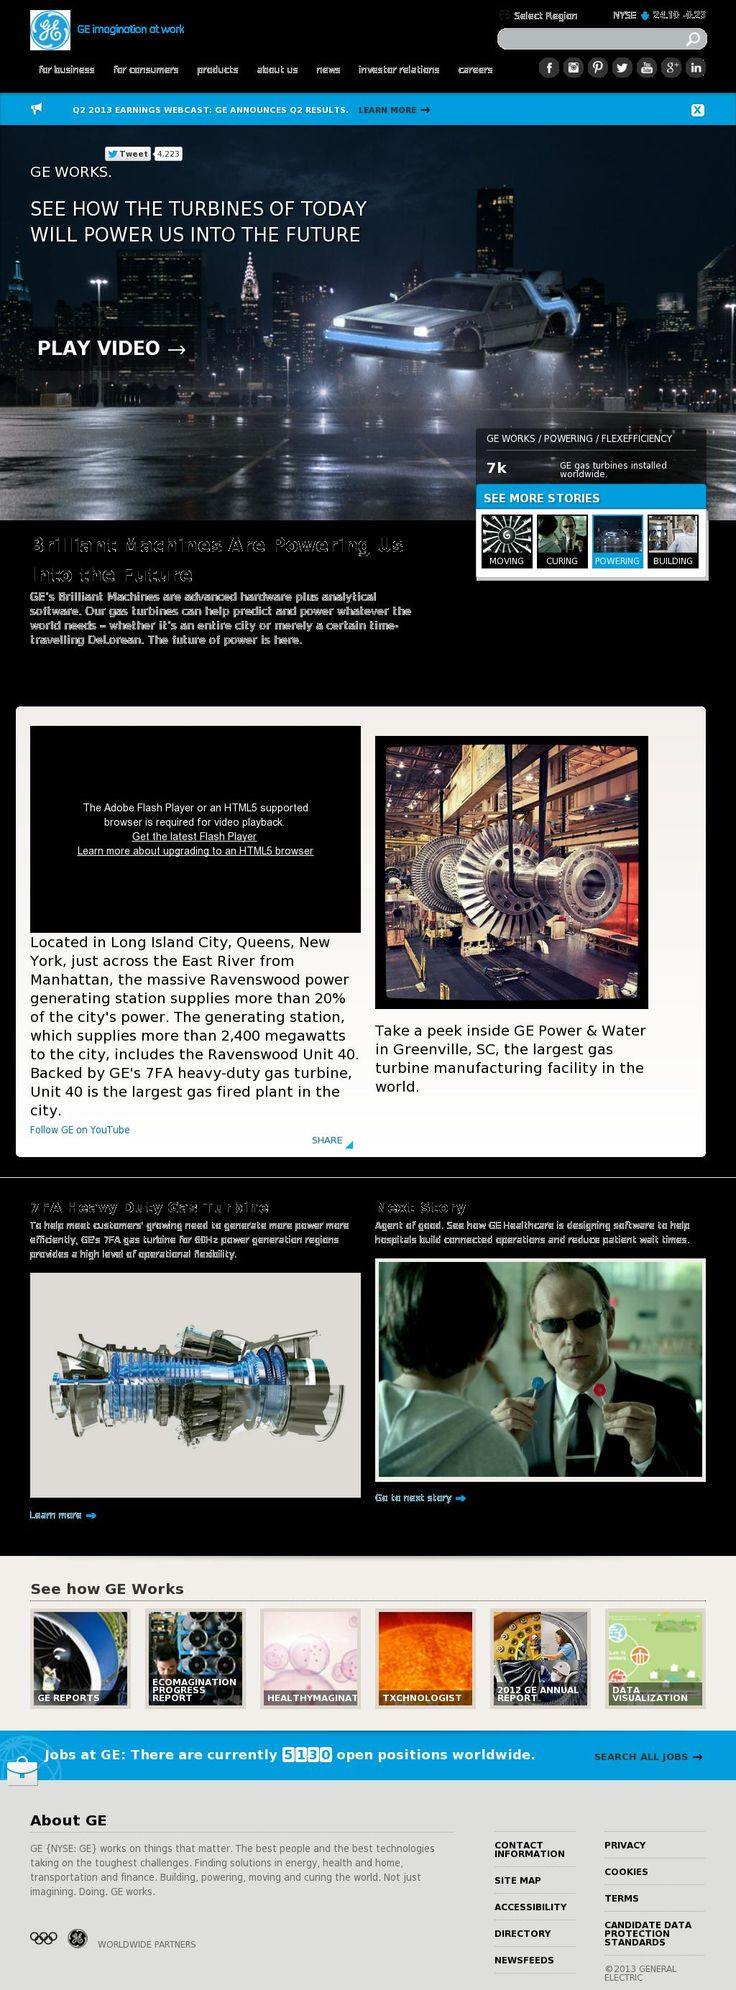 The website 'http://www.ge.com/' courtesy of @Pinstamatic (http://pinstamatic.com)